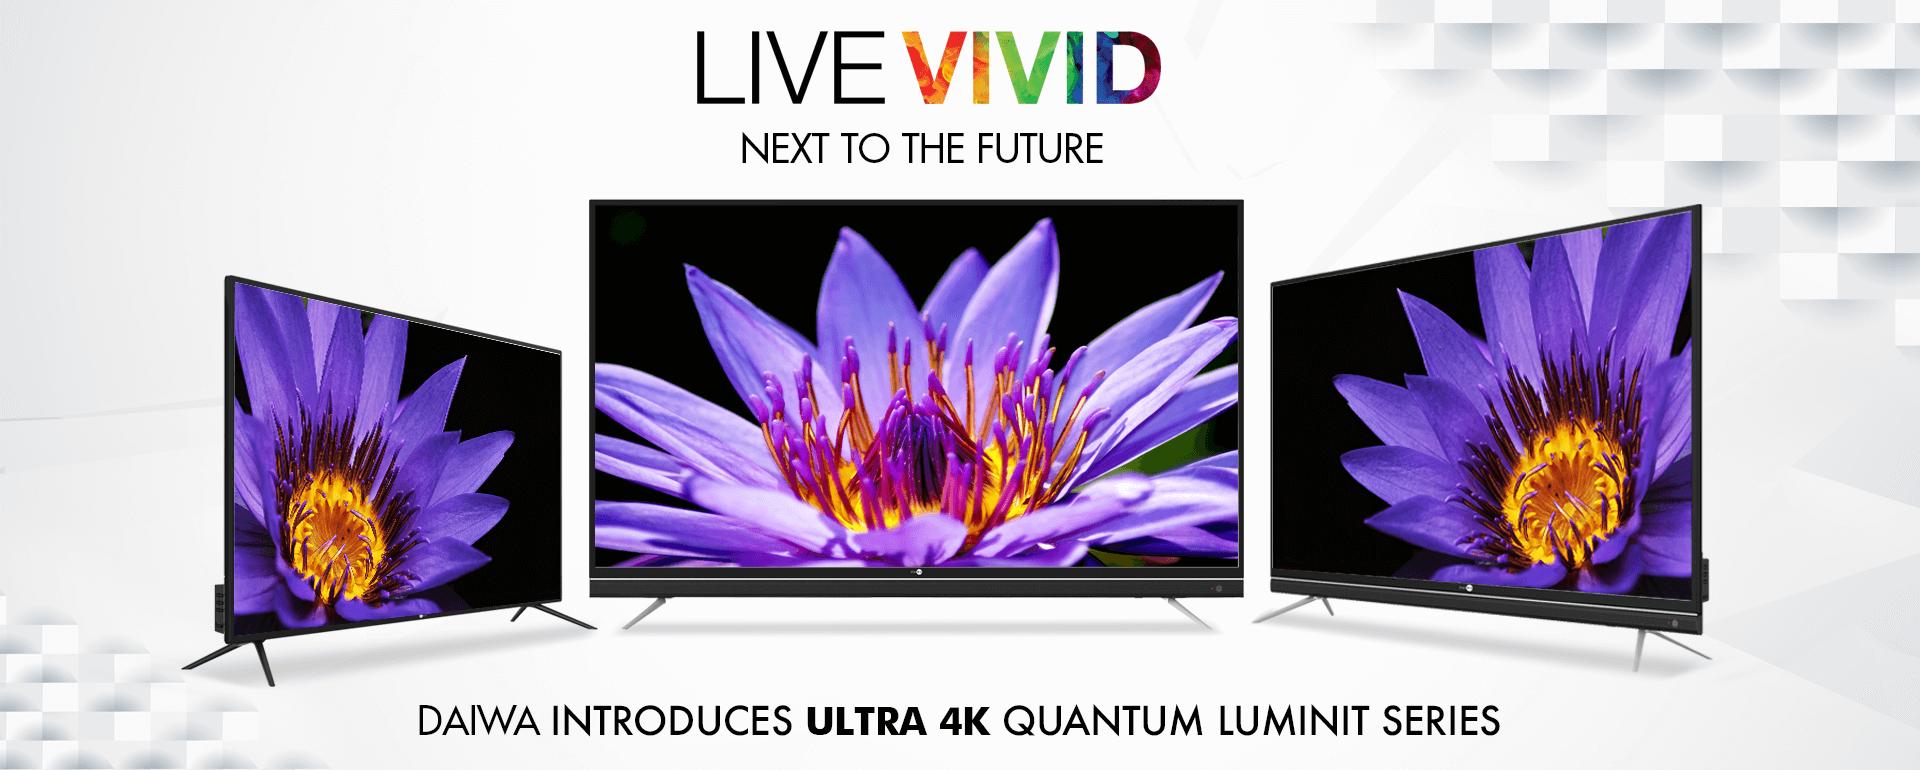 4K UHD Quantum Luminit Smart LED TV